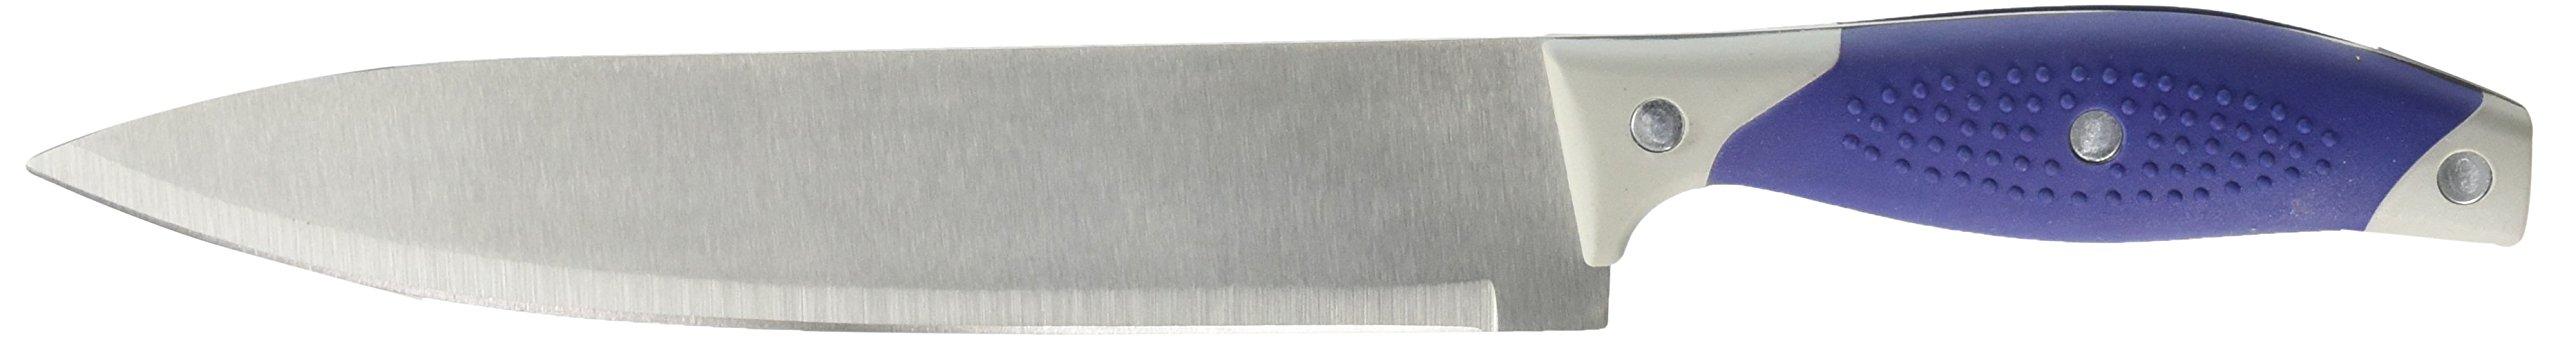 Kole OA611 Professional Chef's Knife, Regular by Kole (Image #1)